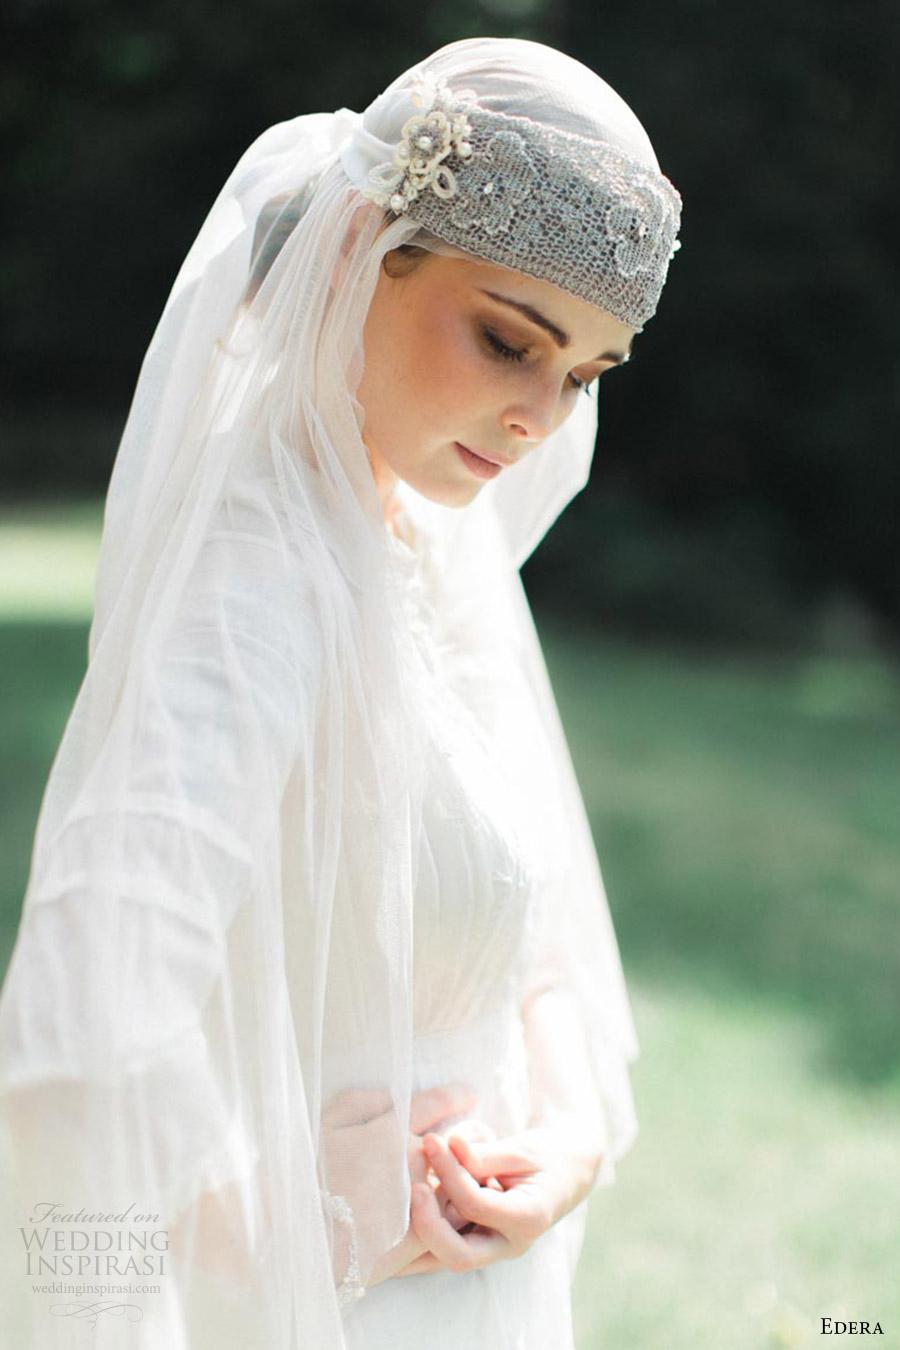 edera jewelry 2016 bridal accessories collection aquarelle (camille) bandeau headband heirloom edwardian style vintage bride